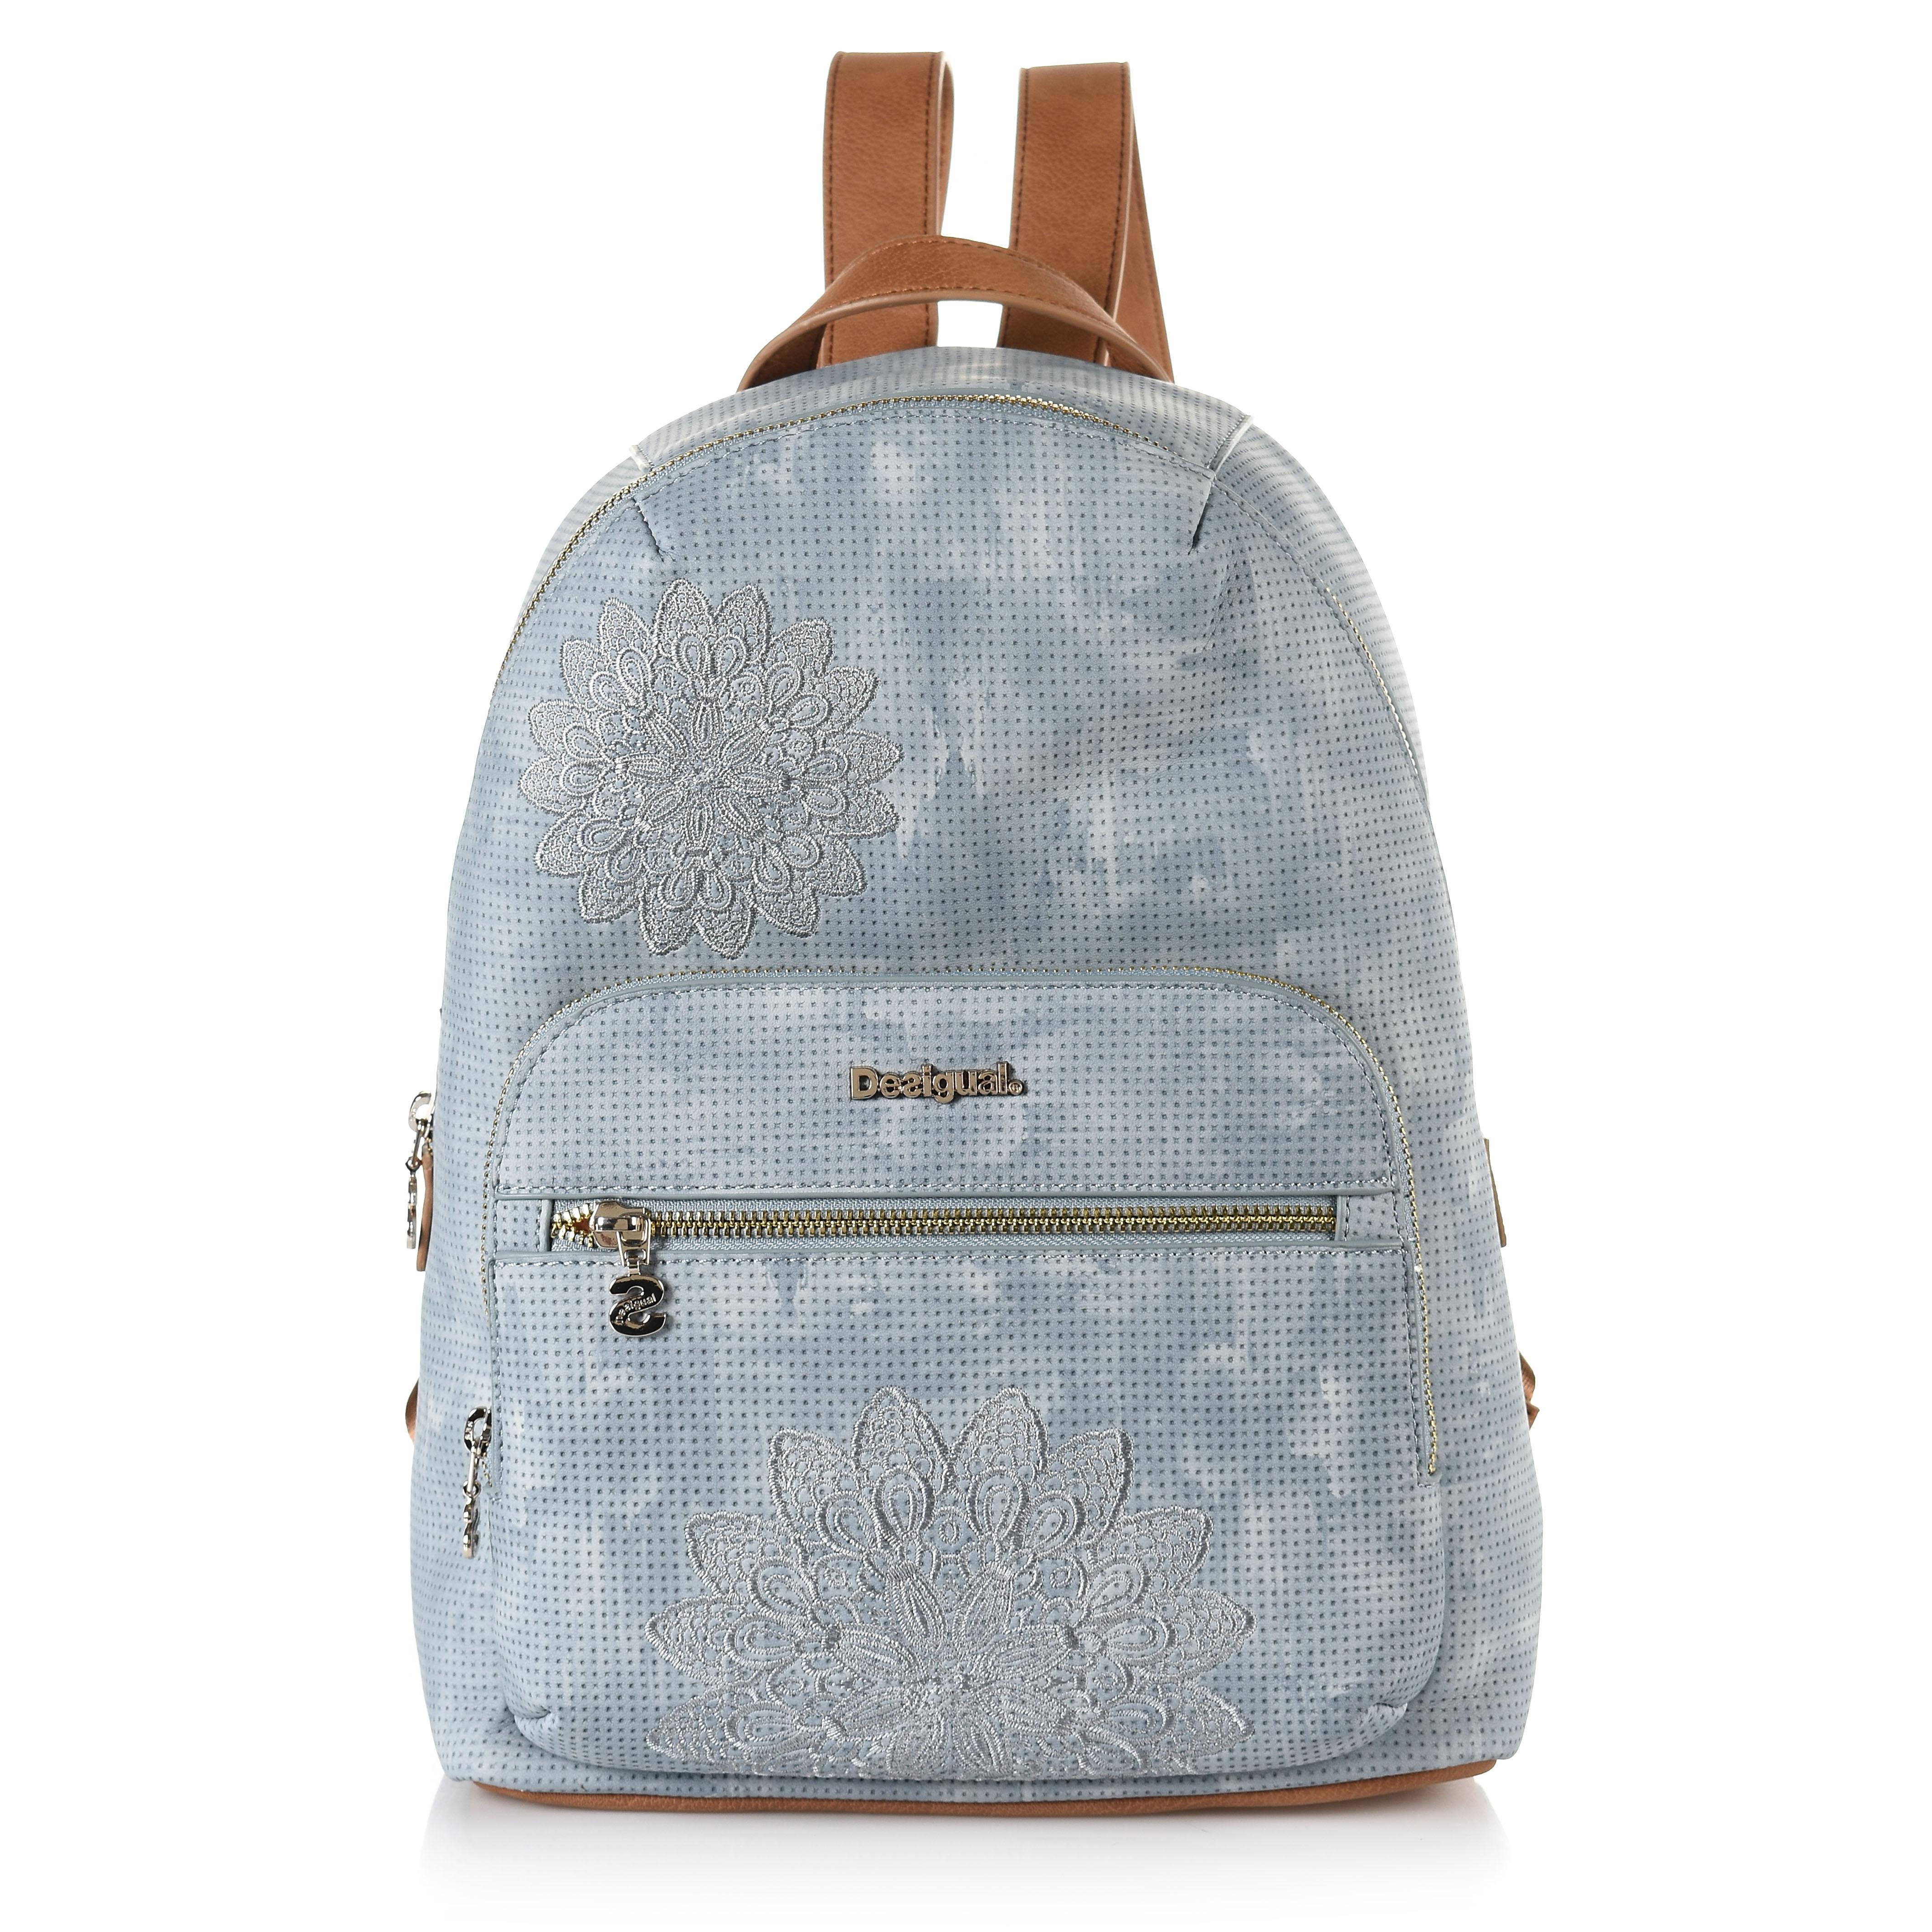 11302ad1e2 Brand Bags Σακίδιο Πλάτης Desigual Bols Atila Lima 19SAXPG6